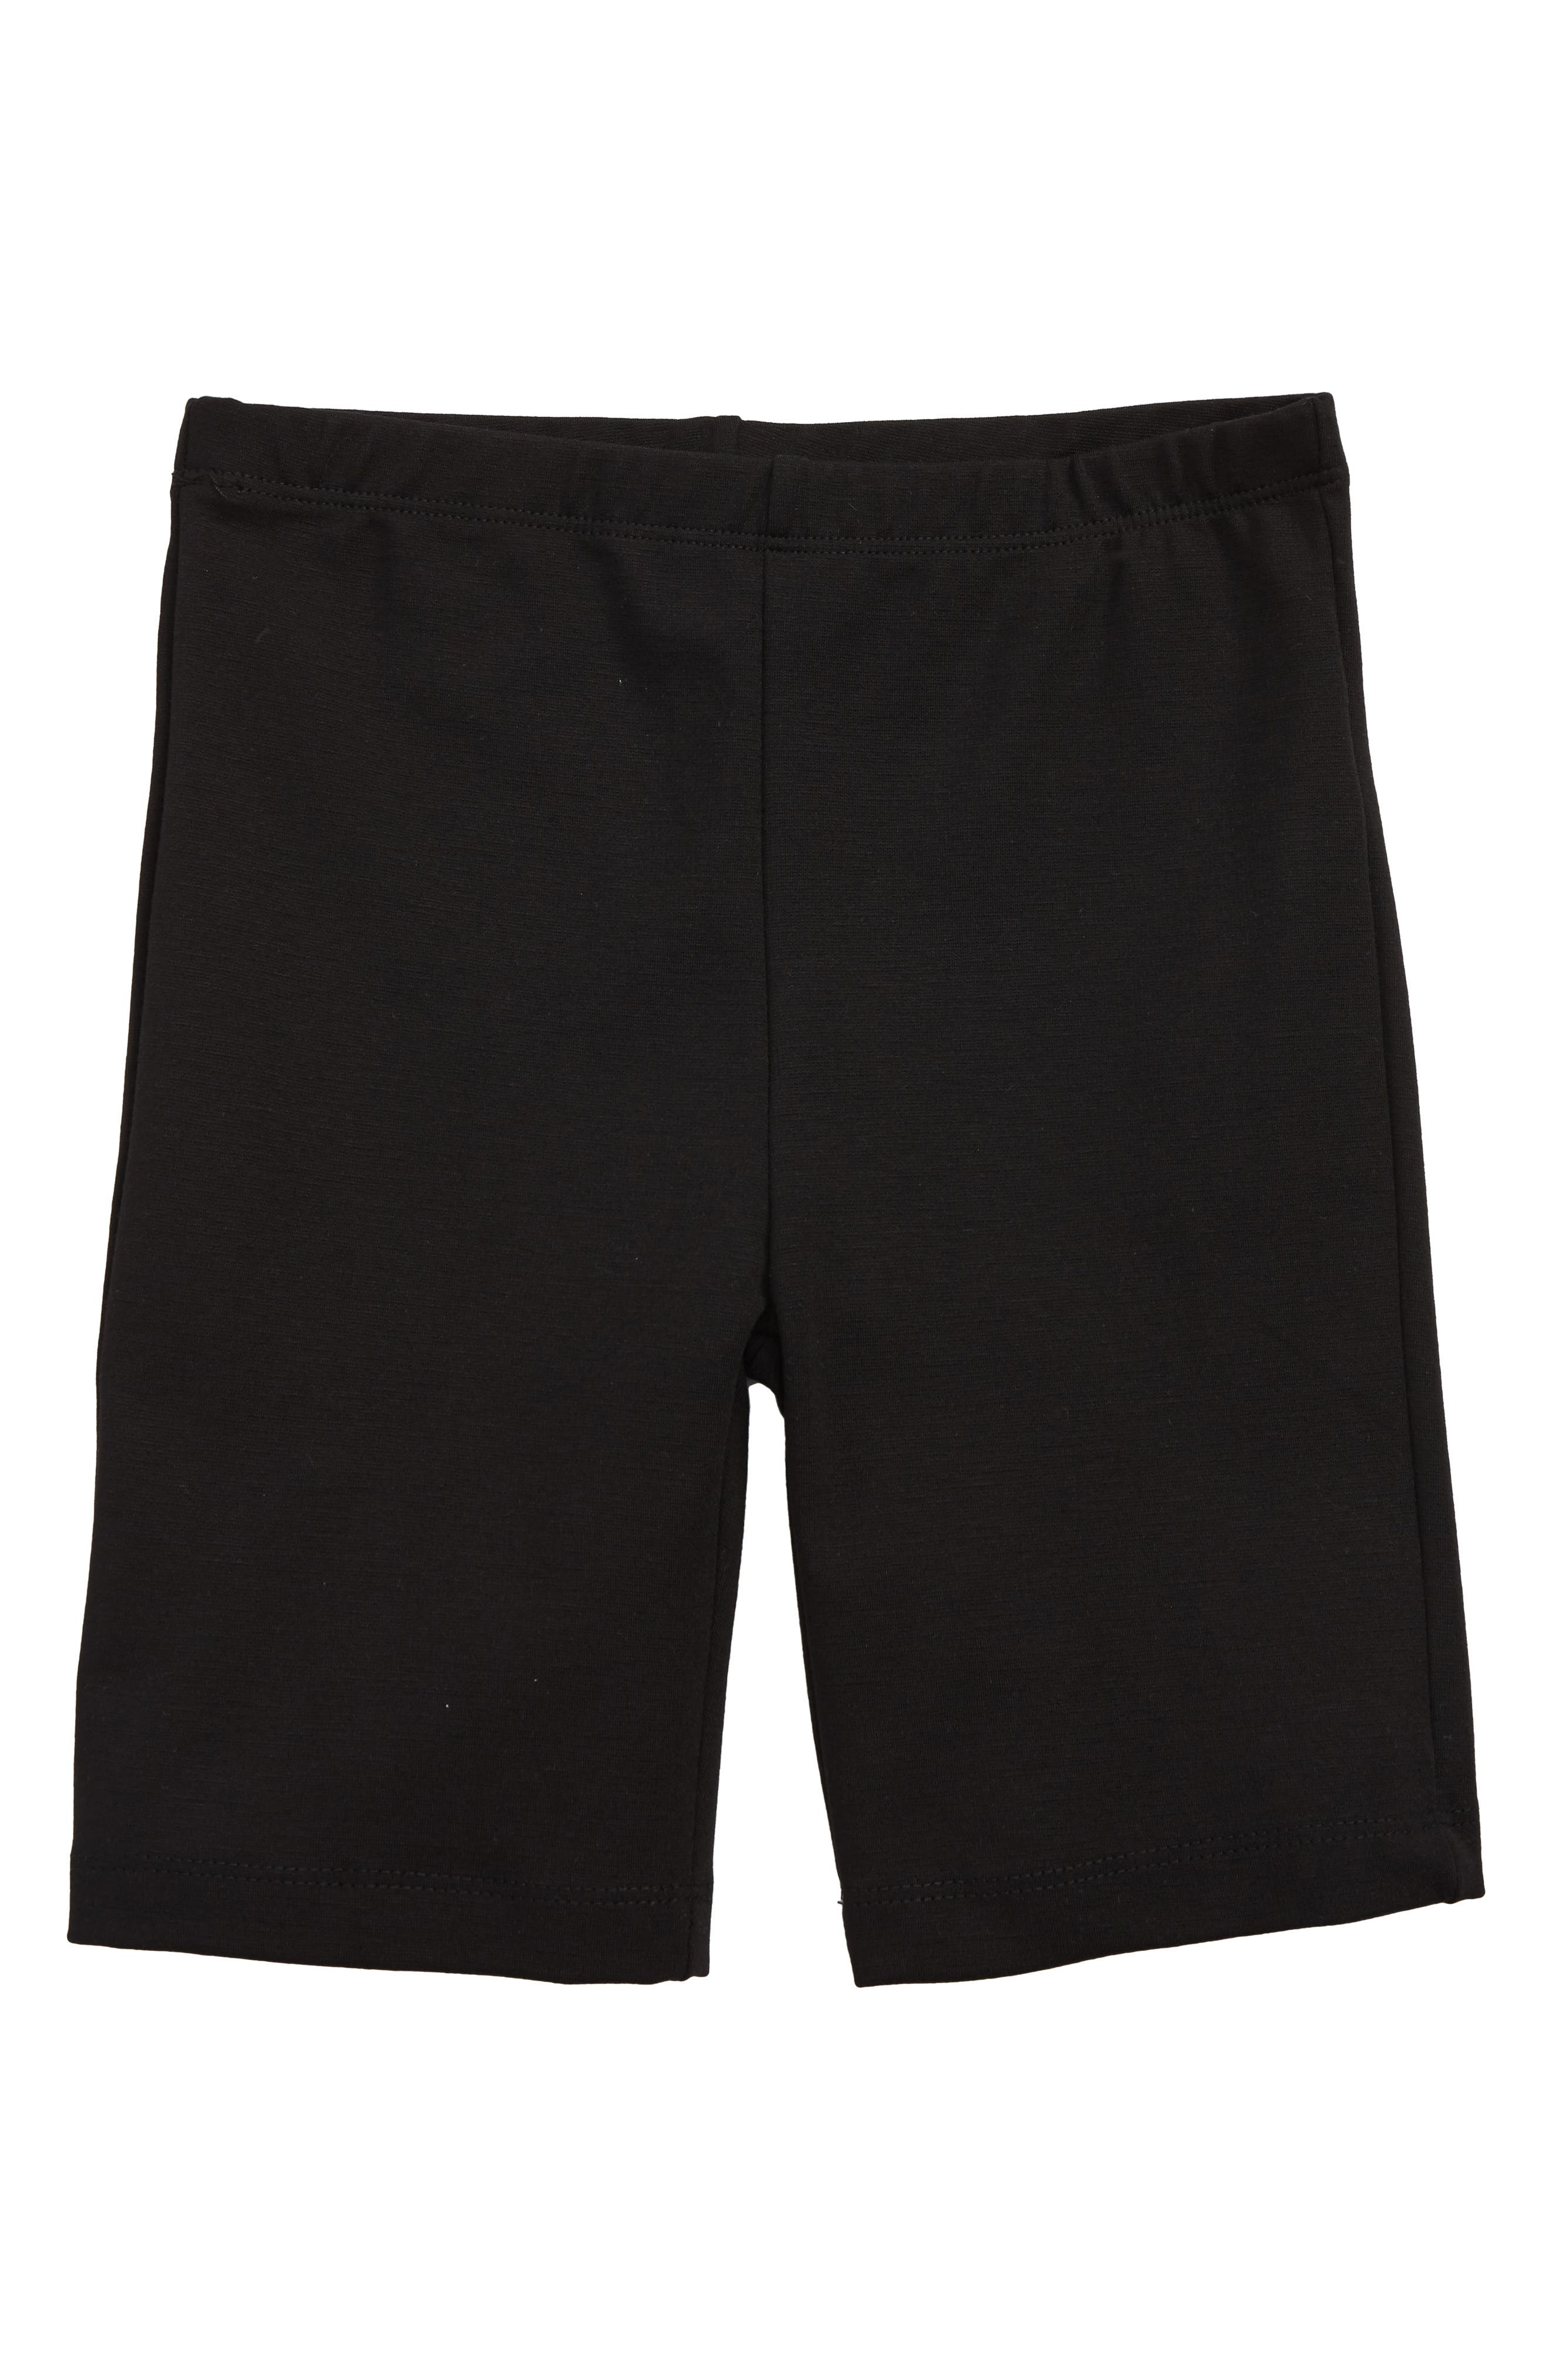 Girls Good Luck Girl Bike Shorts Size XL (16)  Black